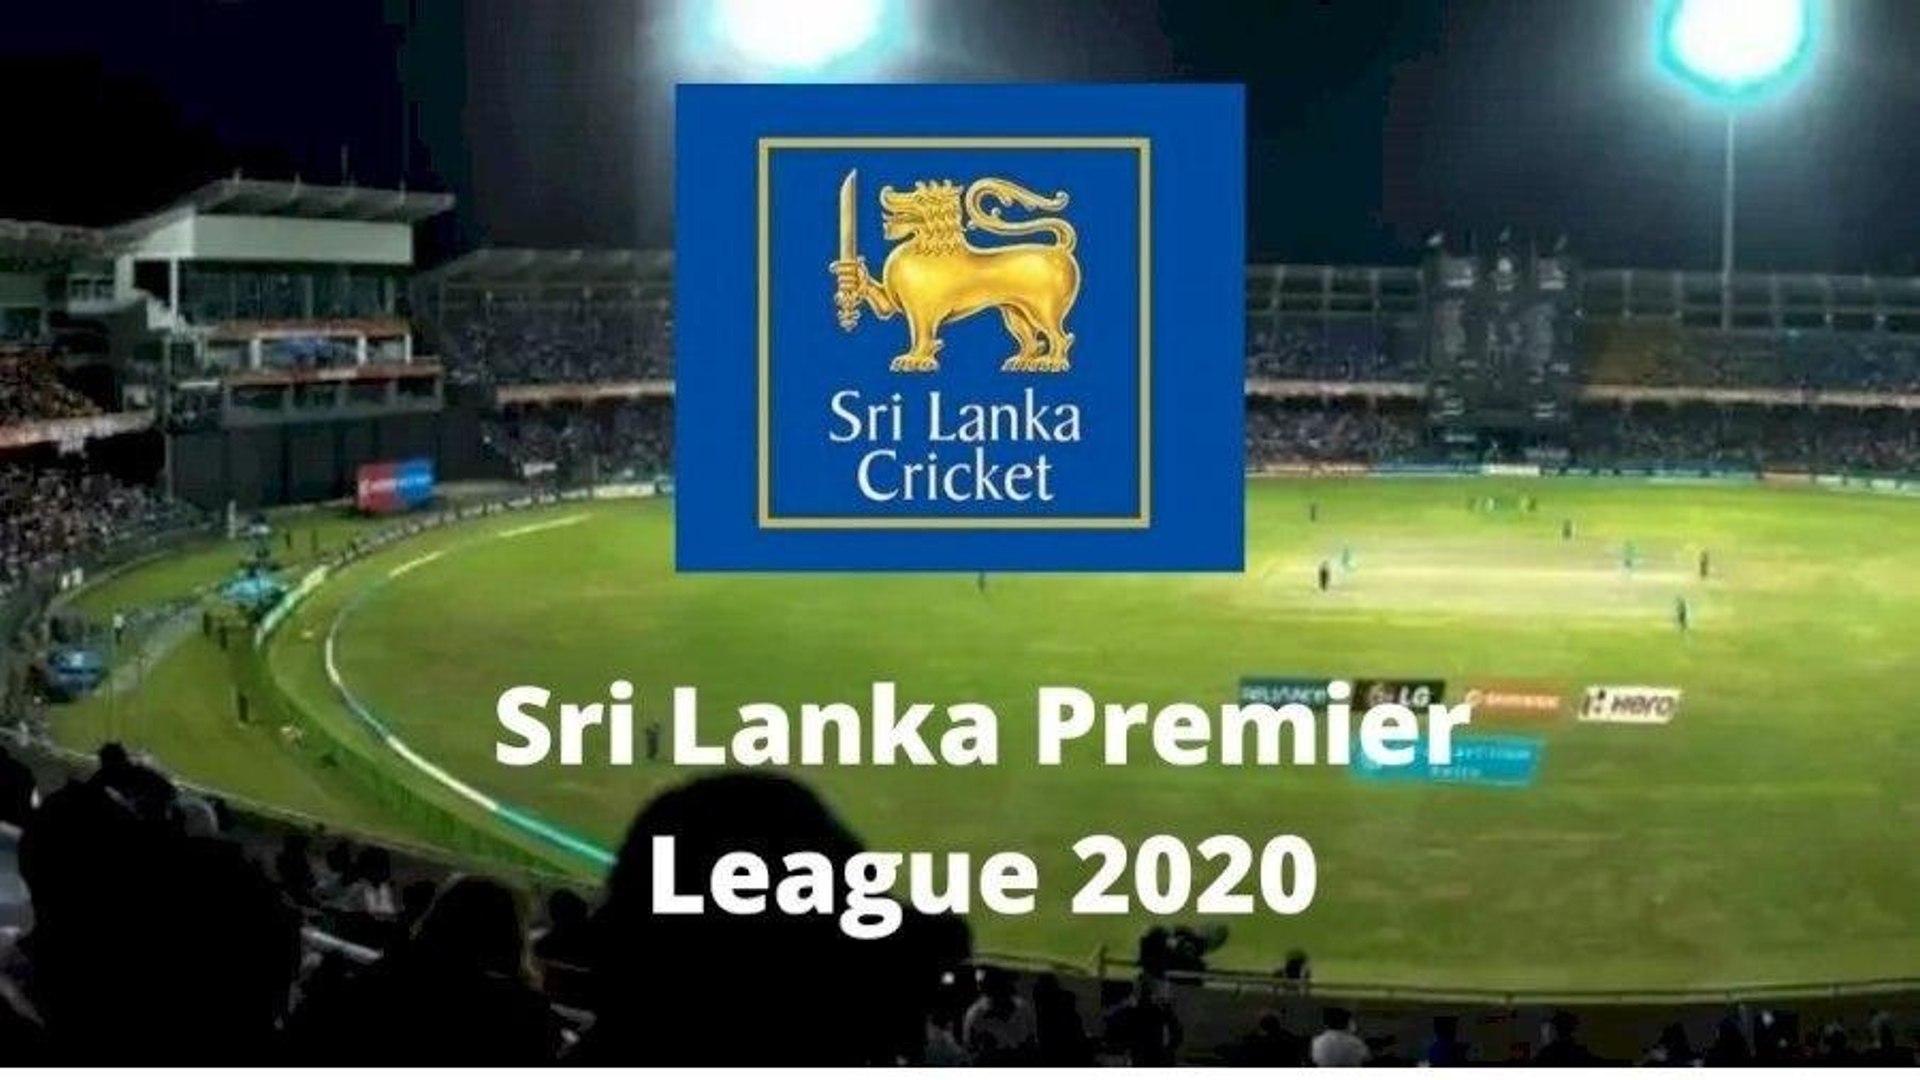 IPL Names ஐ அப்படியே Copy செய்த Lanka Premier League | oneindia - video  dailymotion